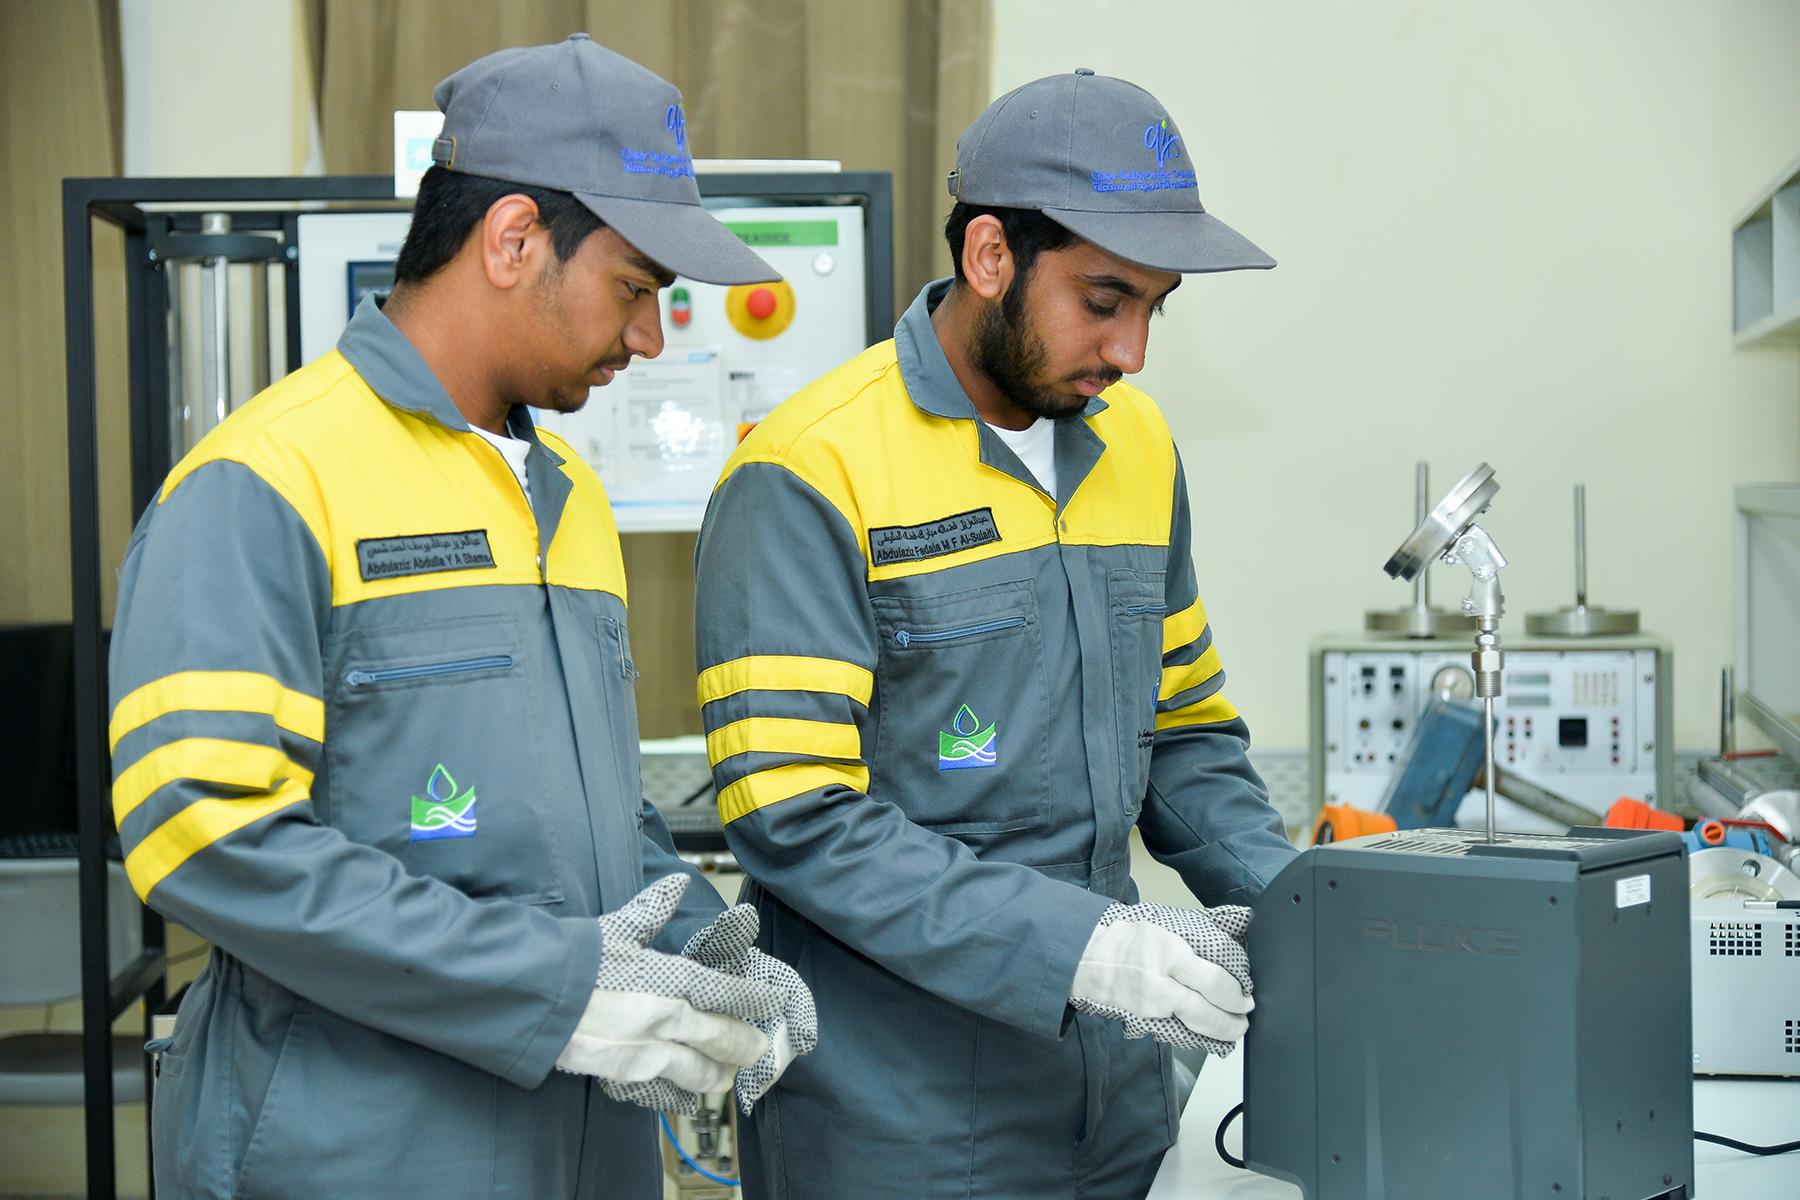 Mechanical engineering students in Qatar